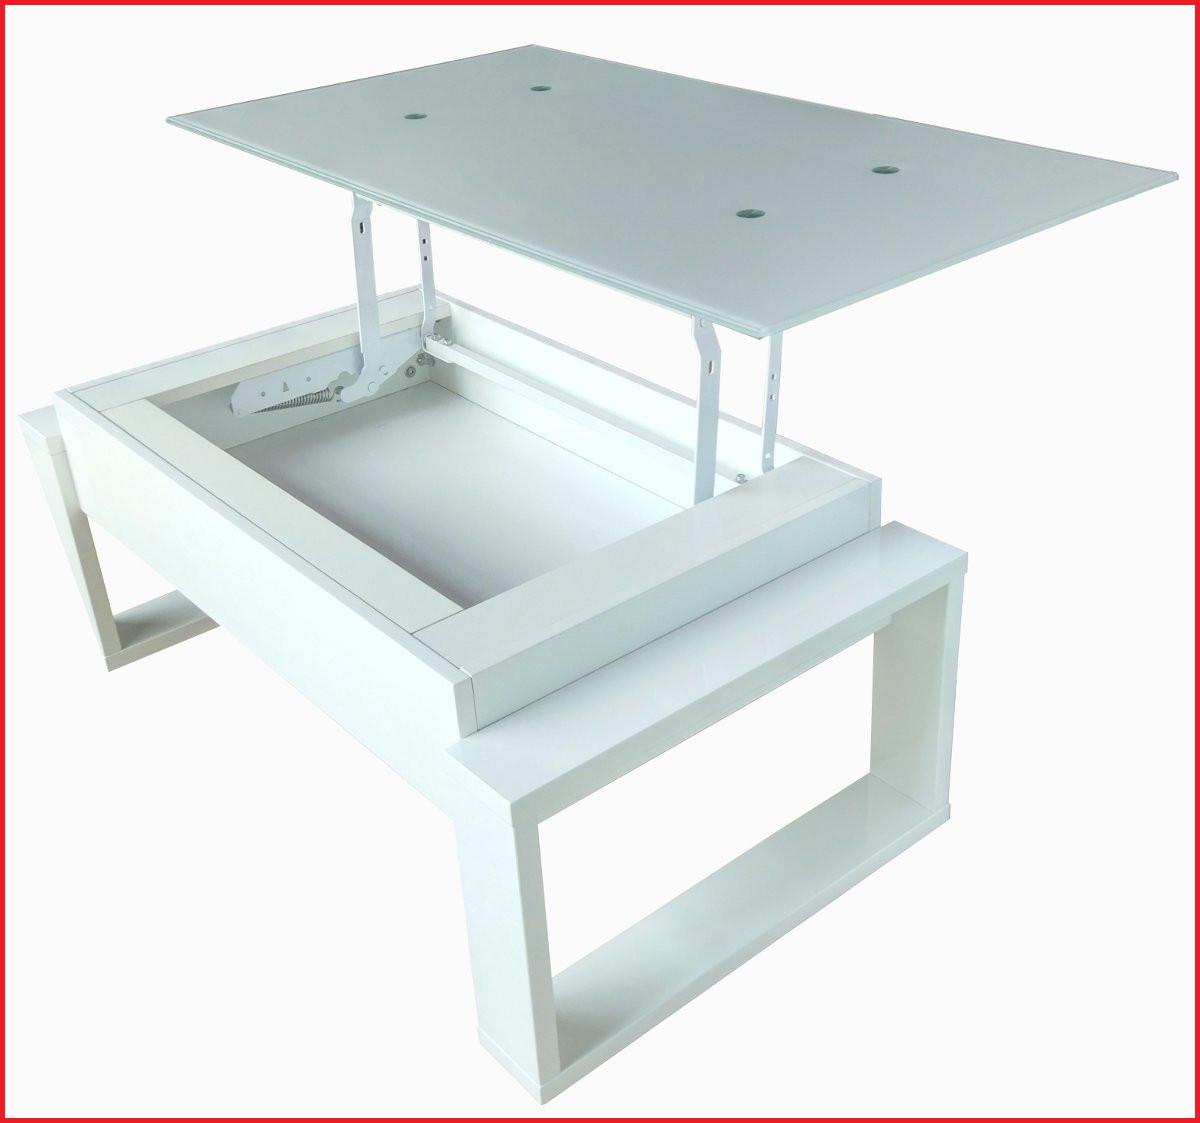 Mesas De Centro Elevables Conforama E9dx Mesa Elevable Y Extensible Conforama Mesa De Centro Elevable